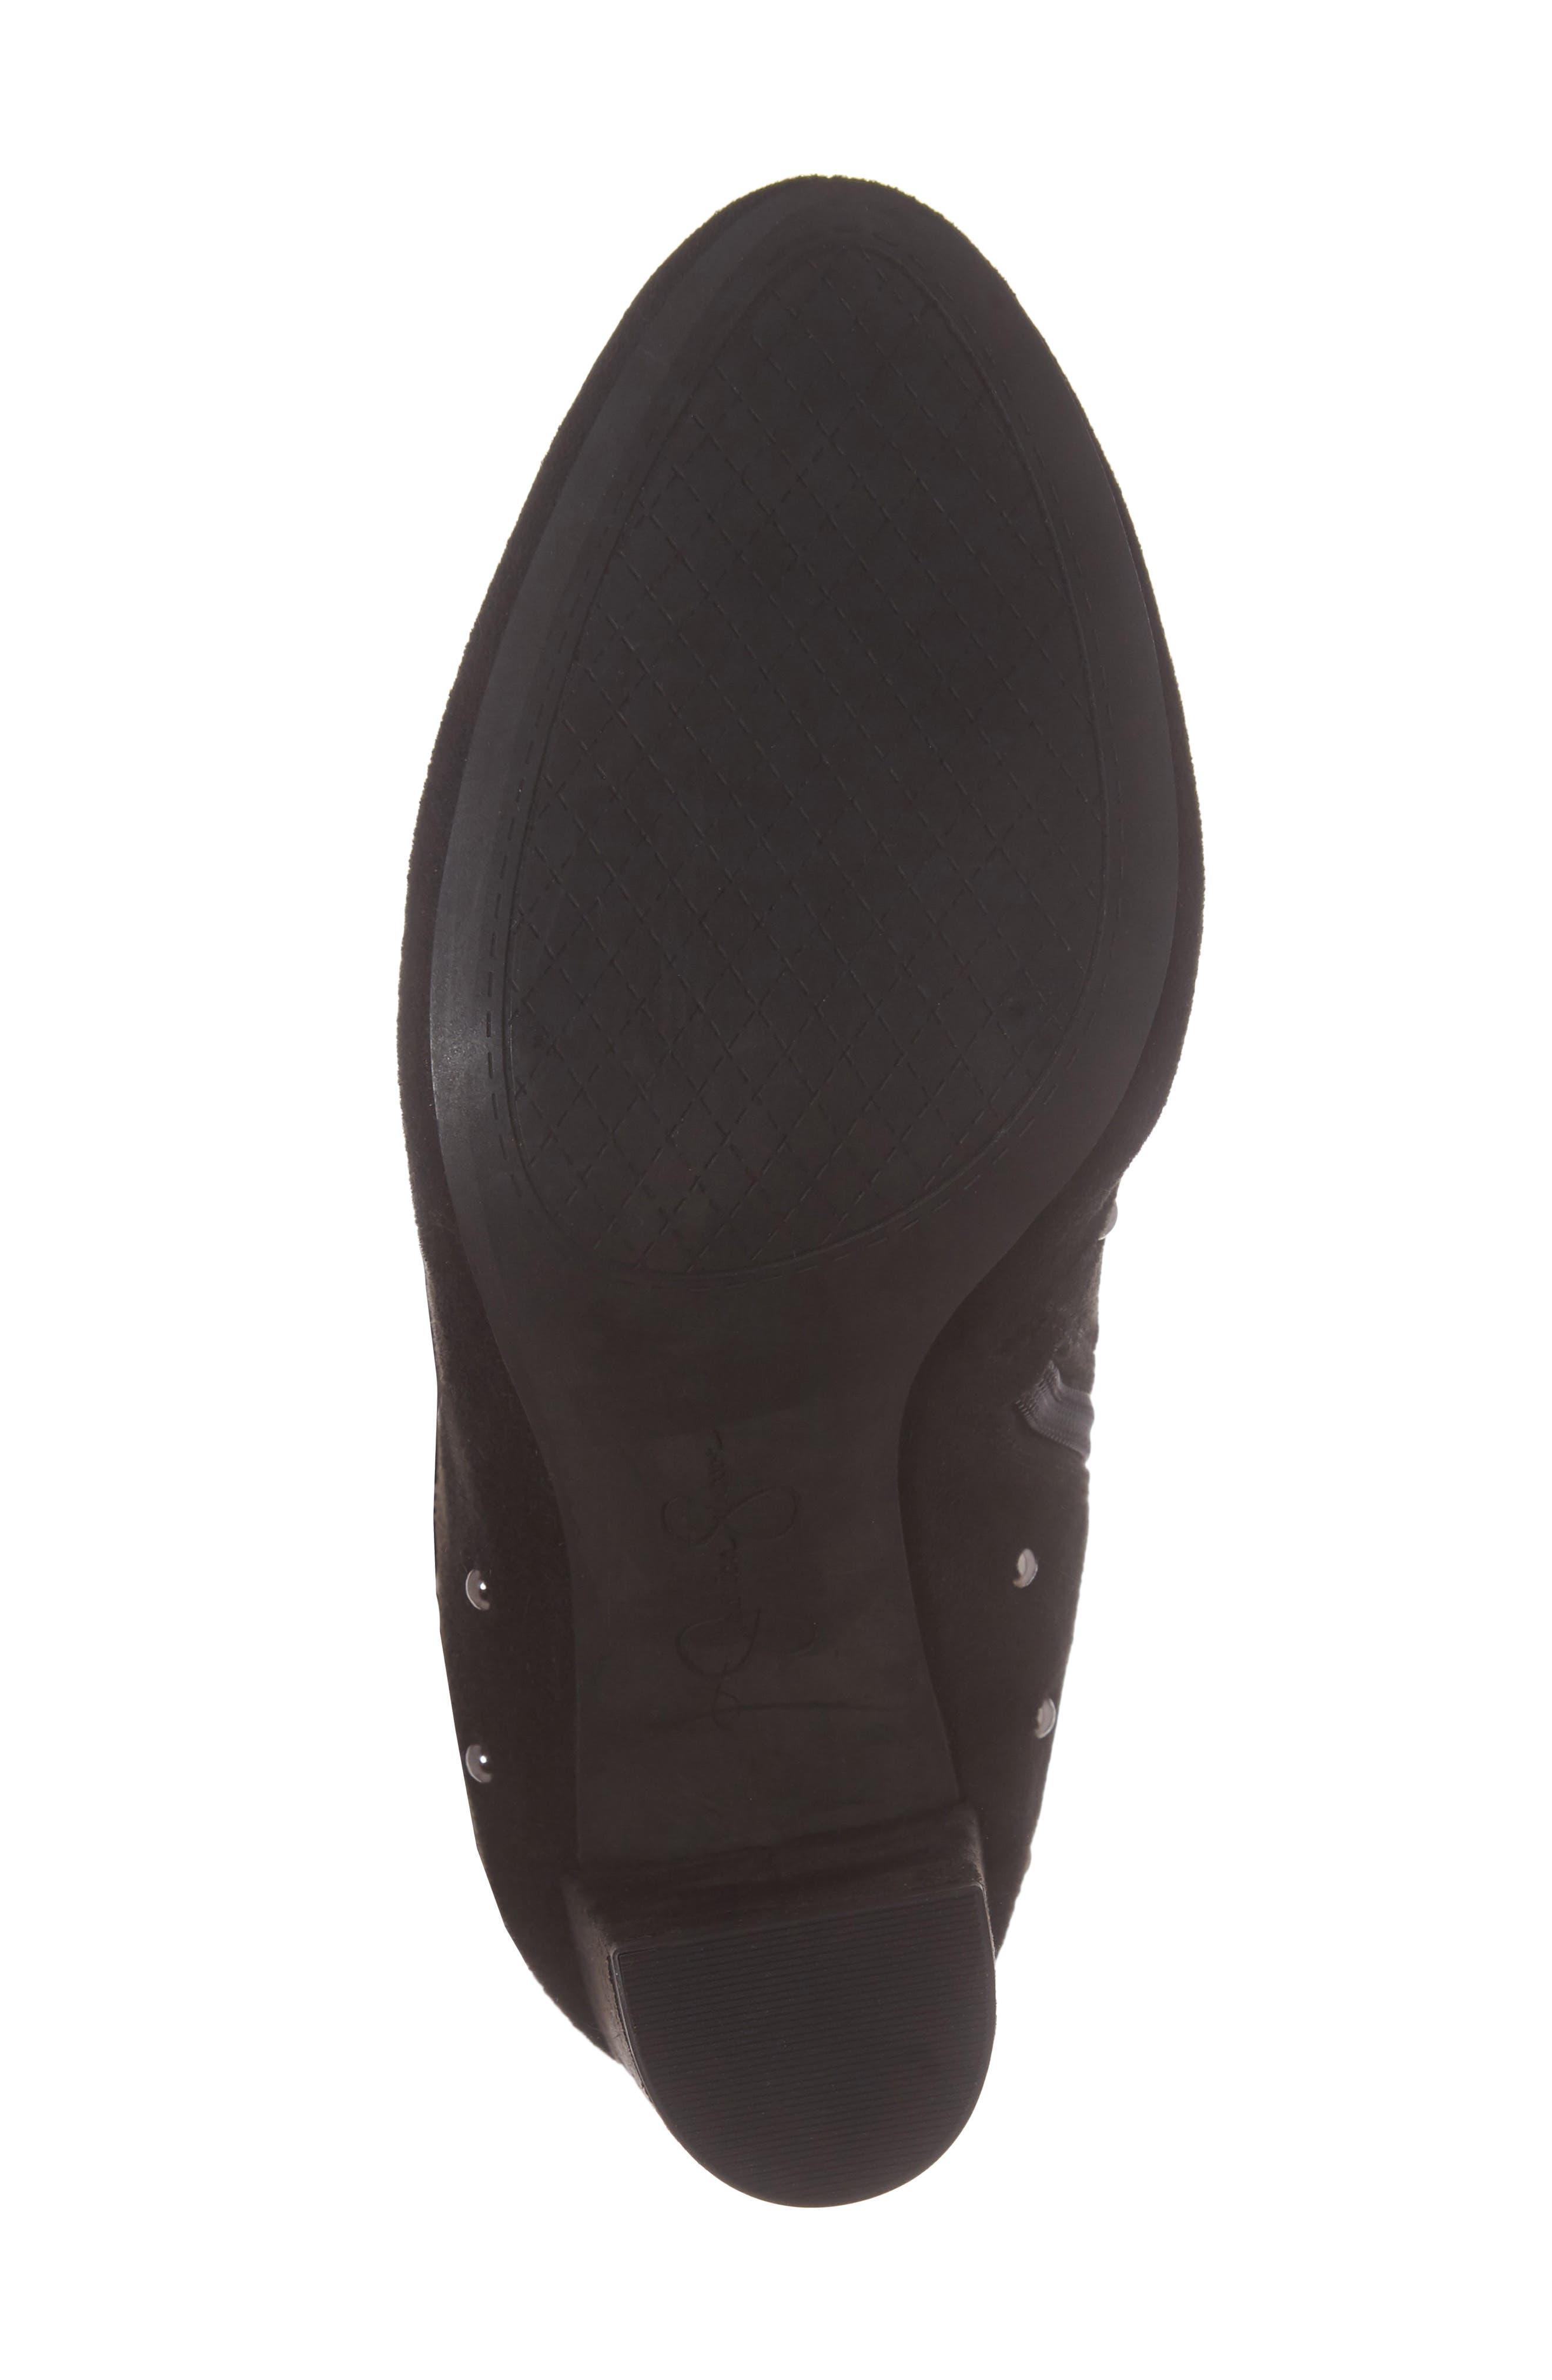 Bressy Studded Over the Knee Boot,                             Alternate thumbnail 6, color,                             001